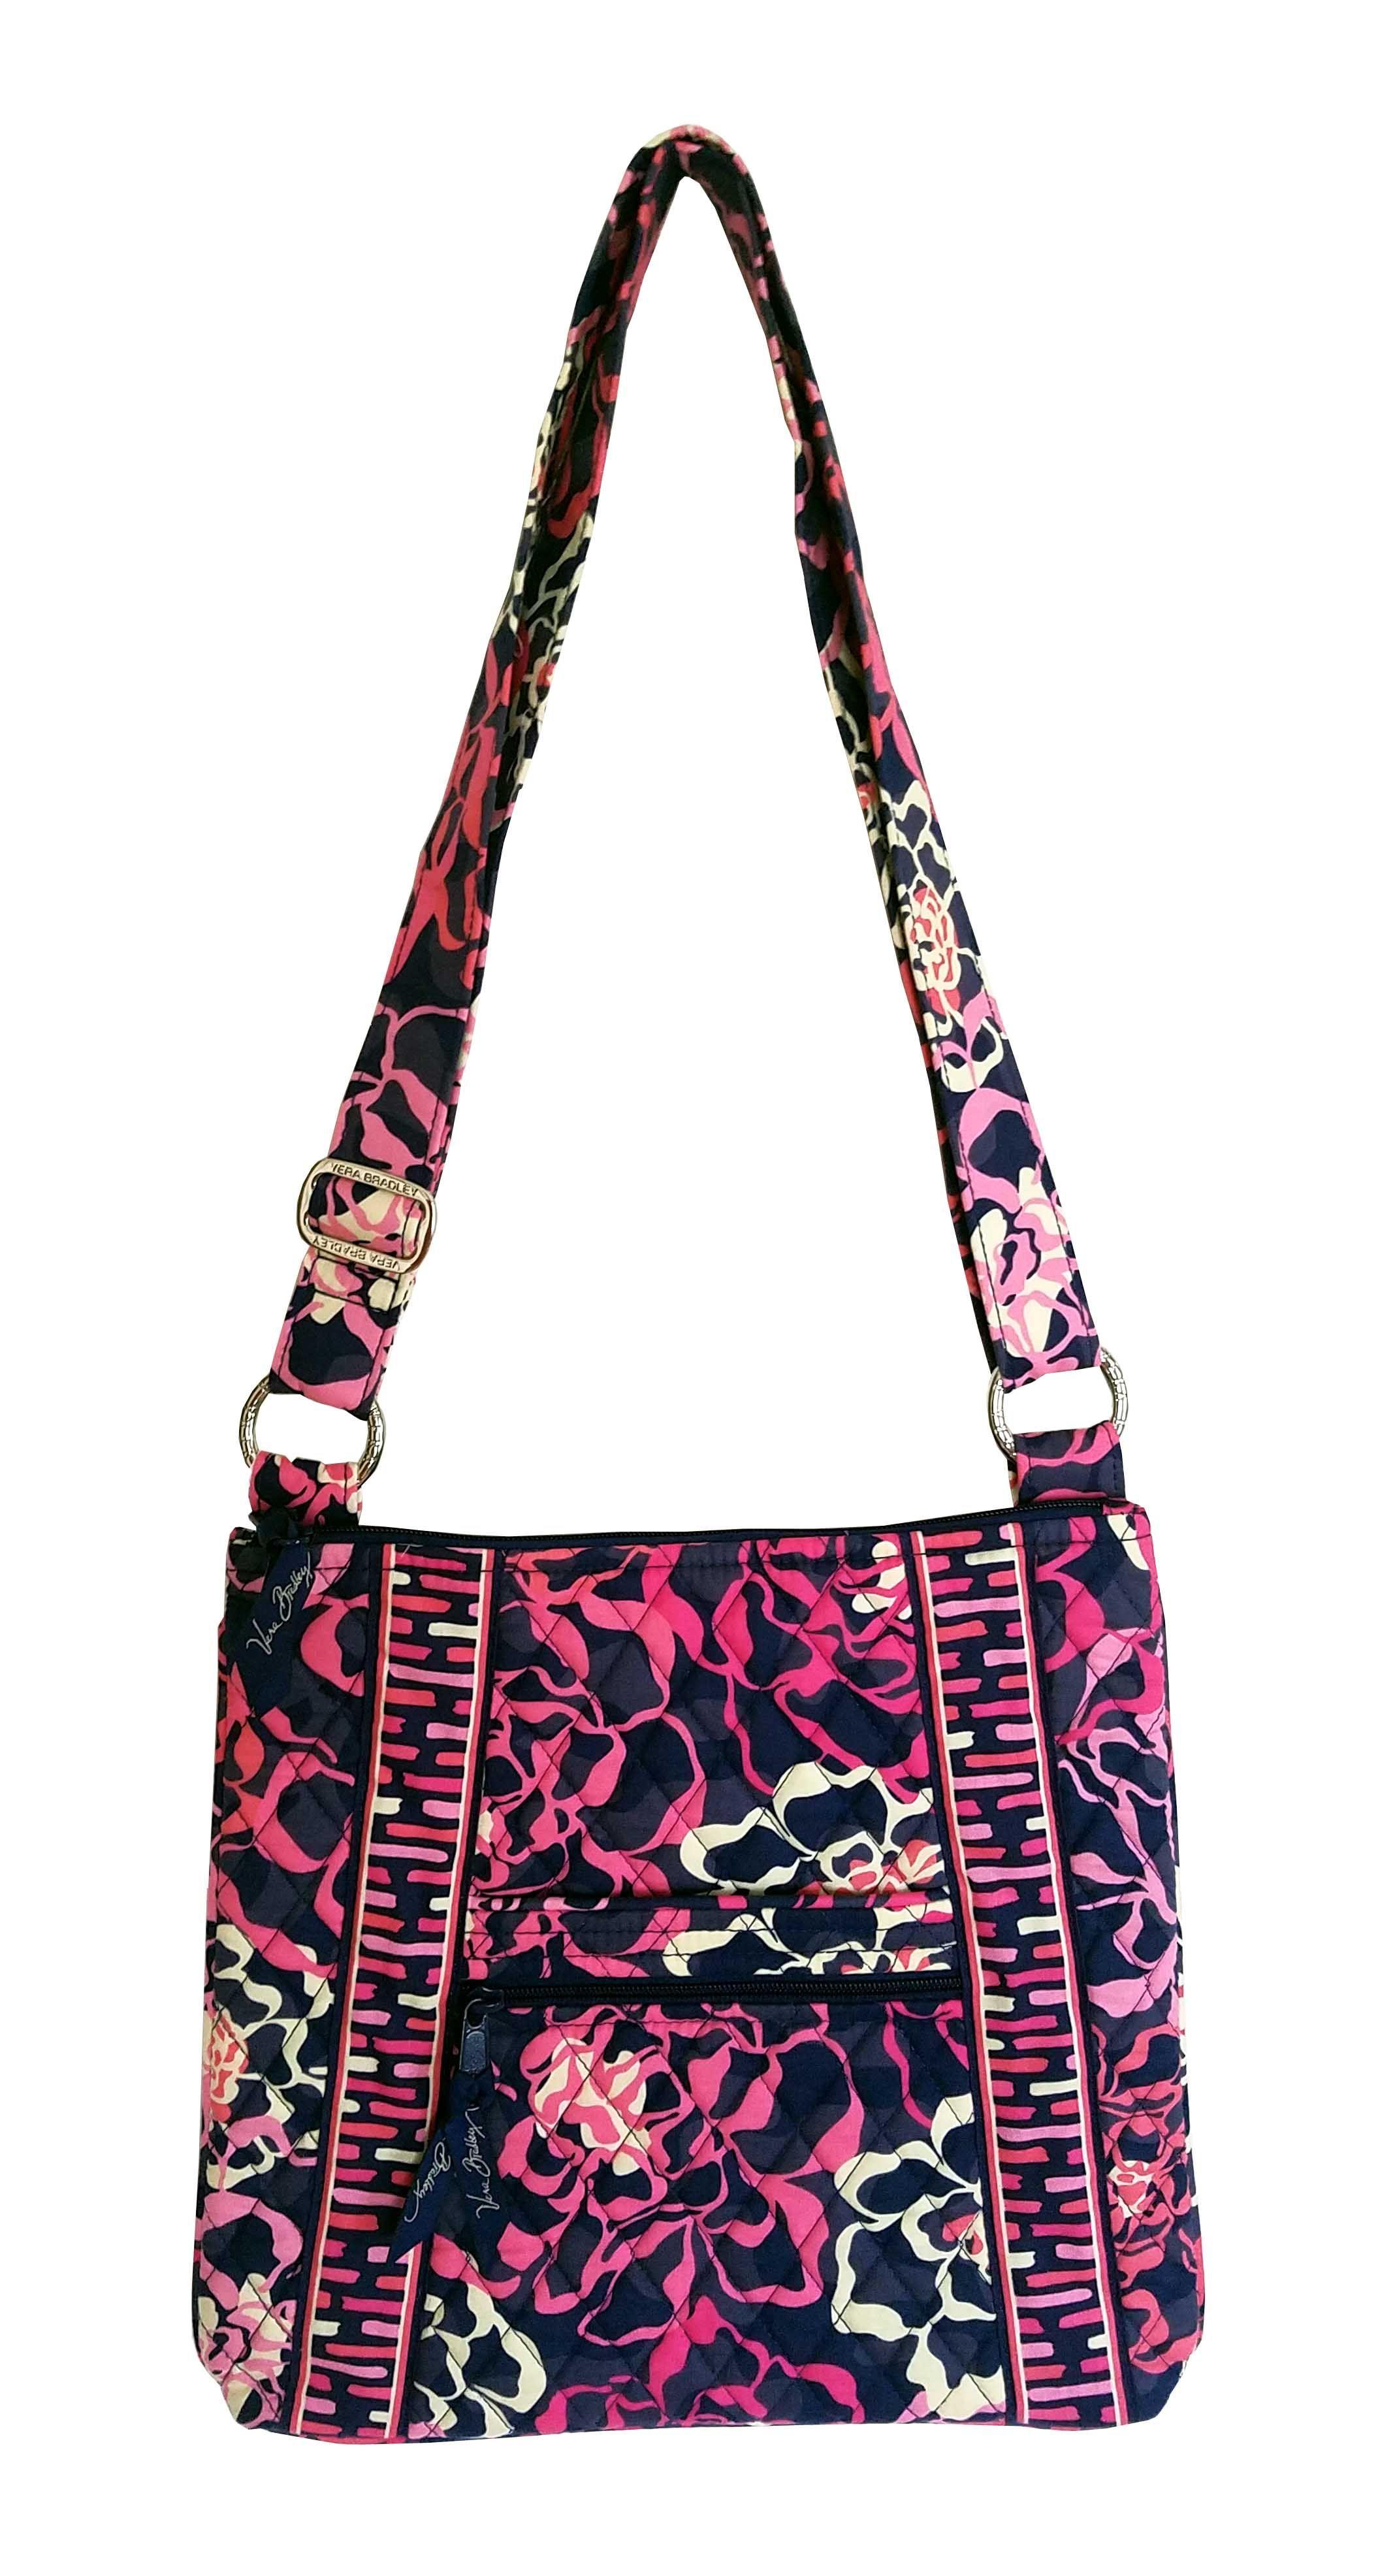 8473e2e4ac Vera Bradley Hipster in Katalina Pink  stellasaksa  verabradley  hipster   katalinapink  pink  crossbody  handbag